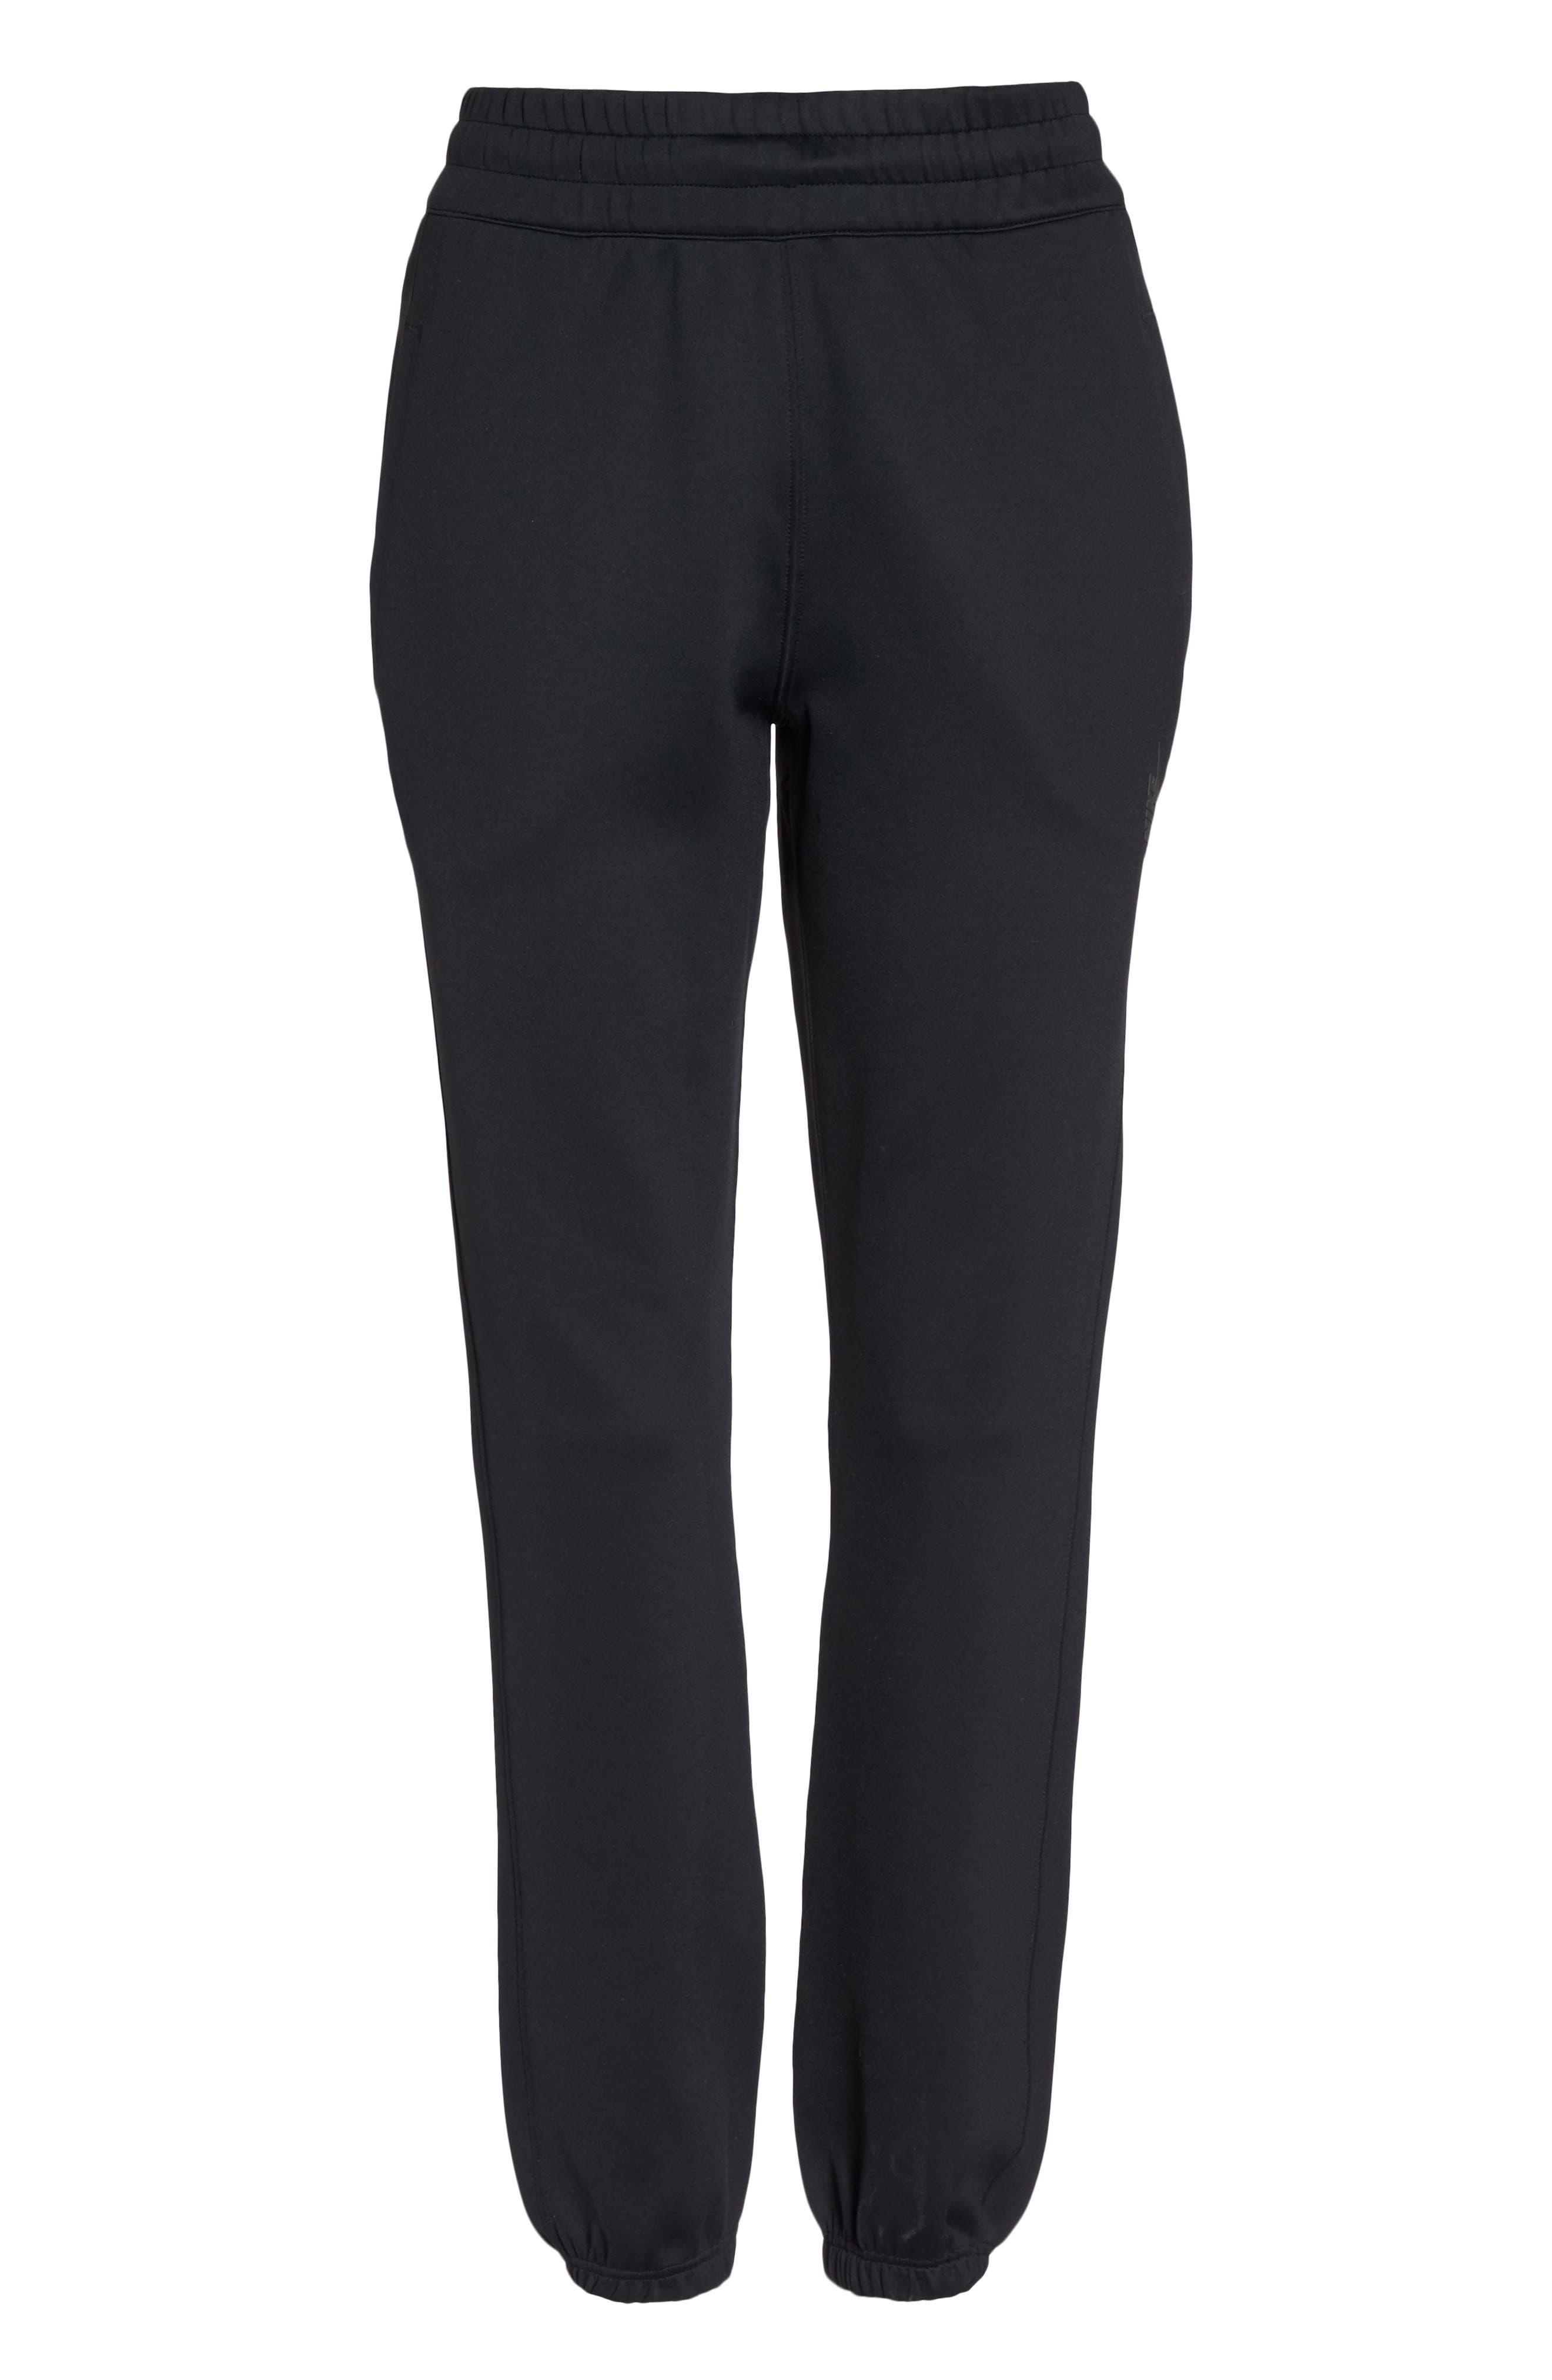 NikeLab Essentials Women's Fleece Pants,                             Alternate thumbnail 7, color,                             010